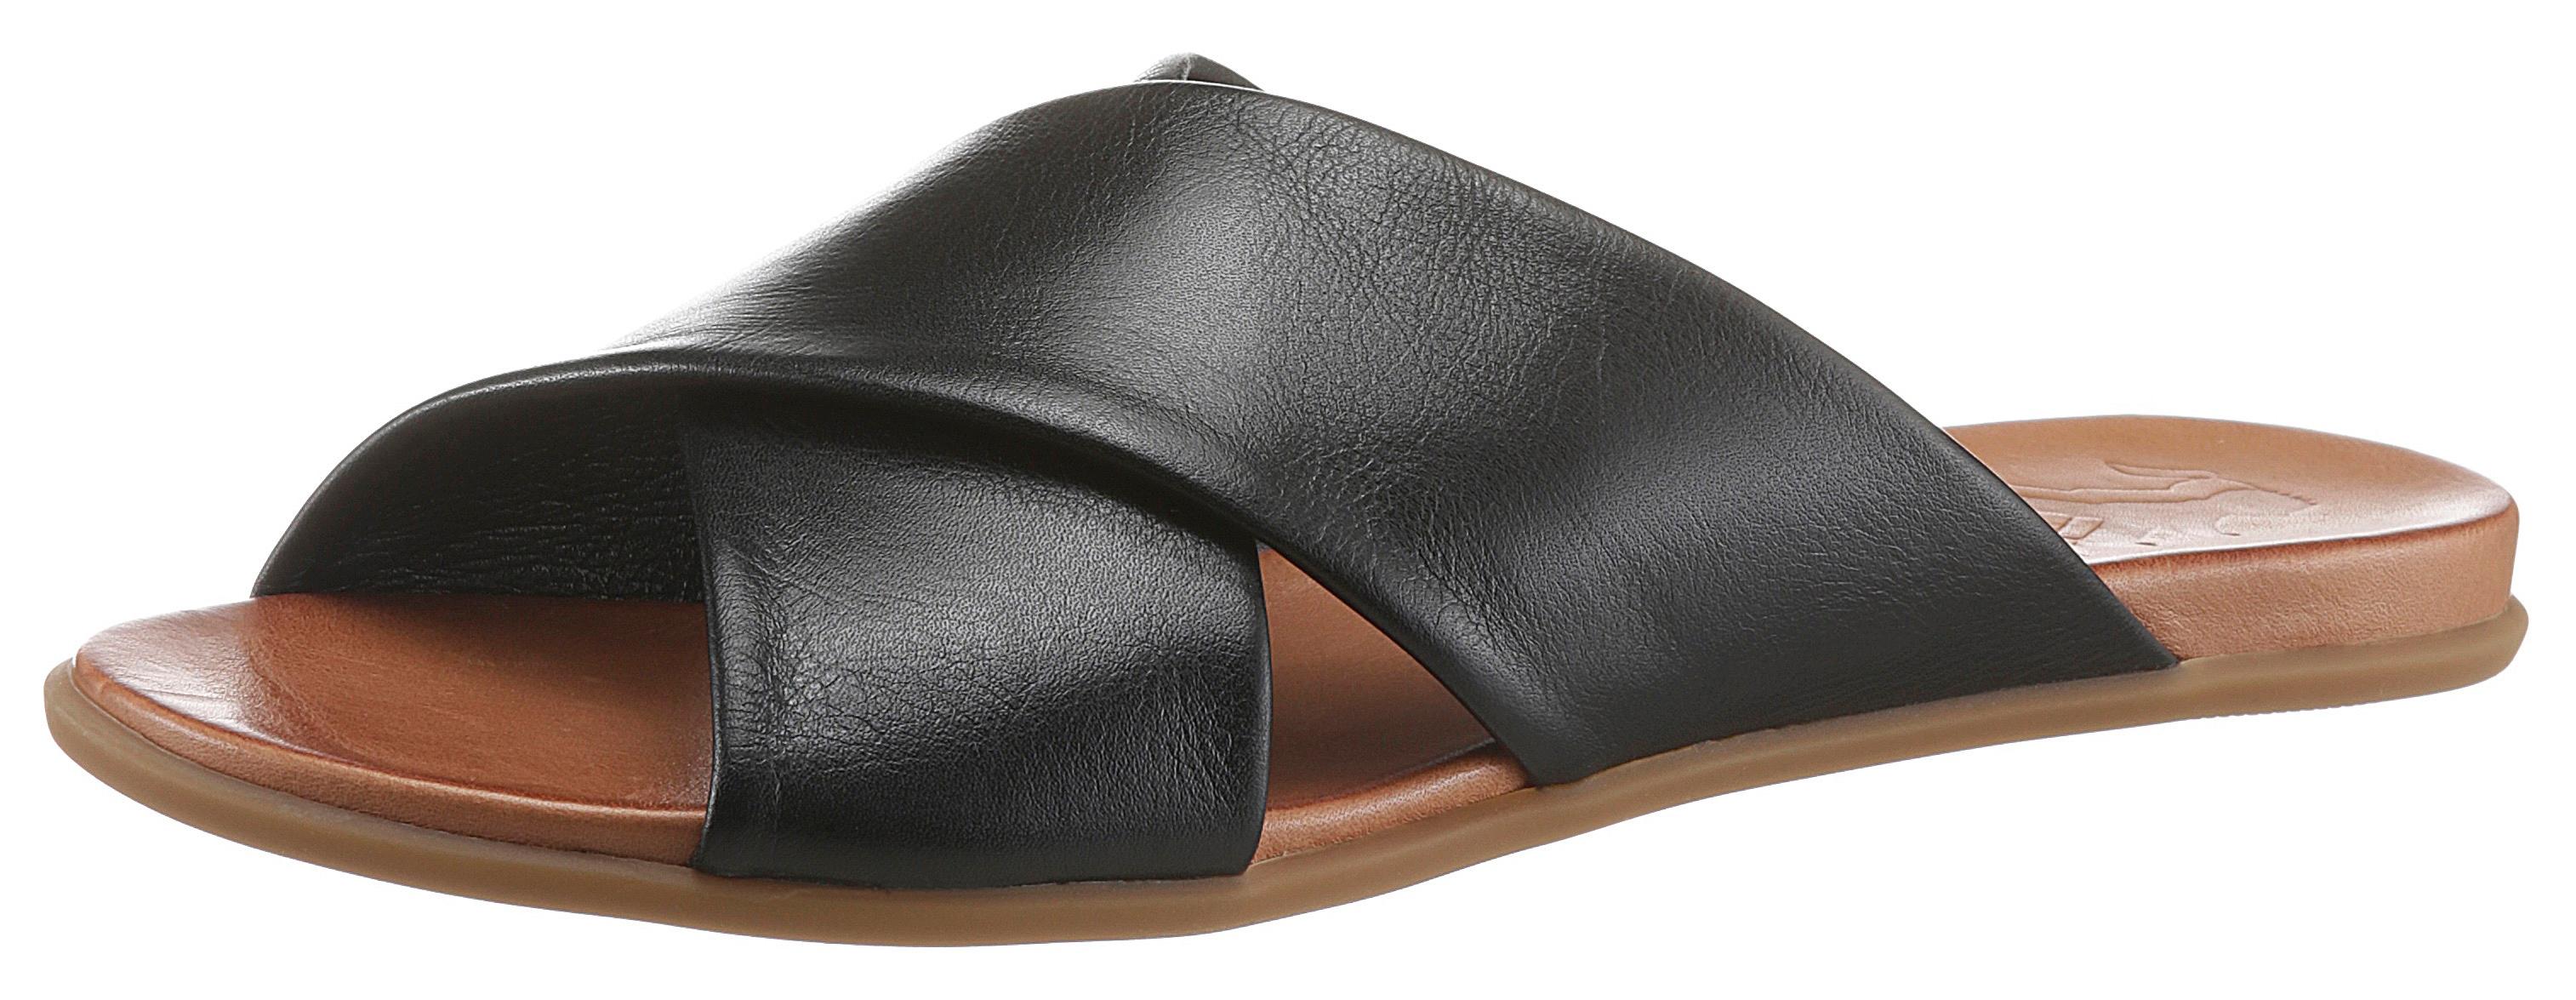 Image of 2GO FASHION Pantolette, mit leichter Gummilaufsohle